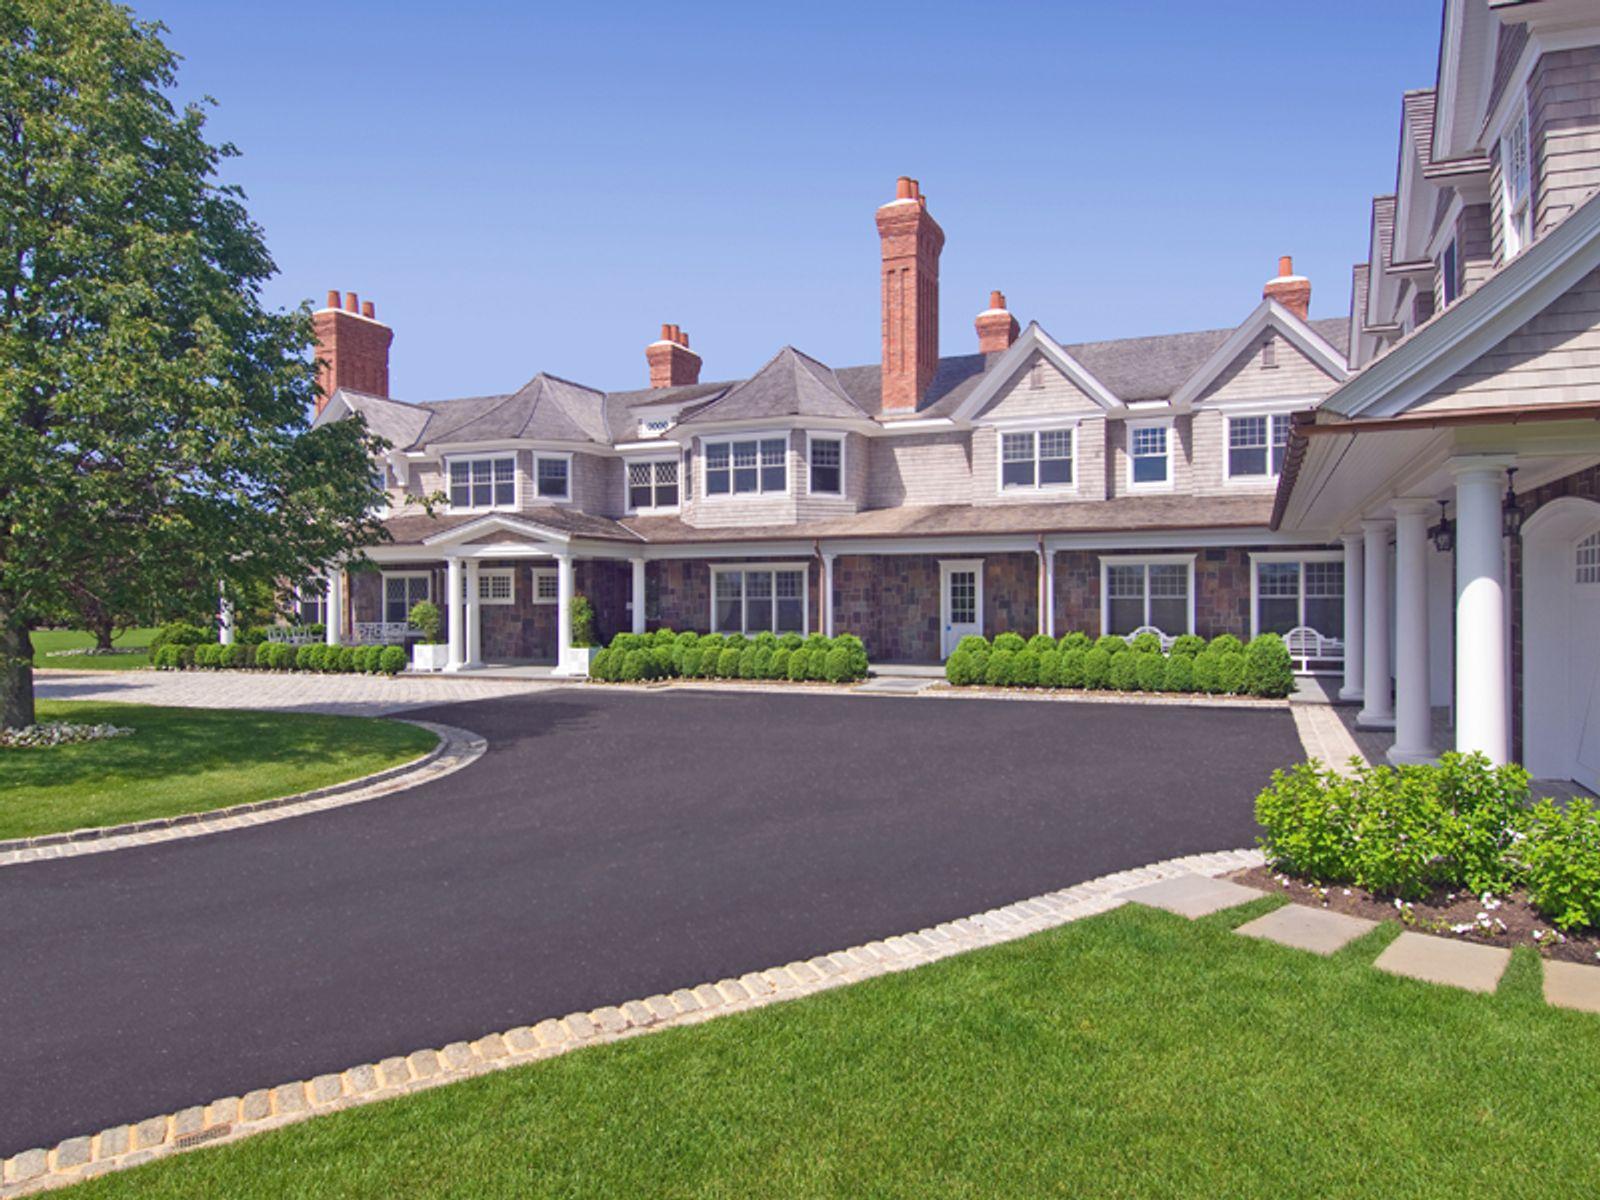 Sandcastle bridgehampton ny single family home hamptons for Luxury hamptons real estate